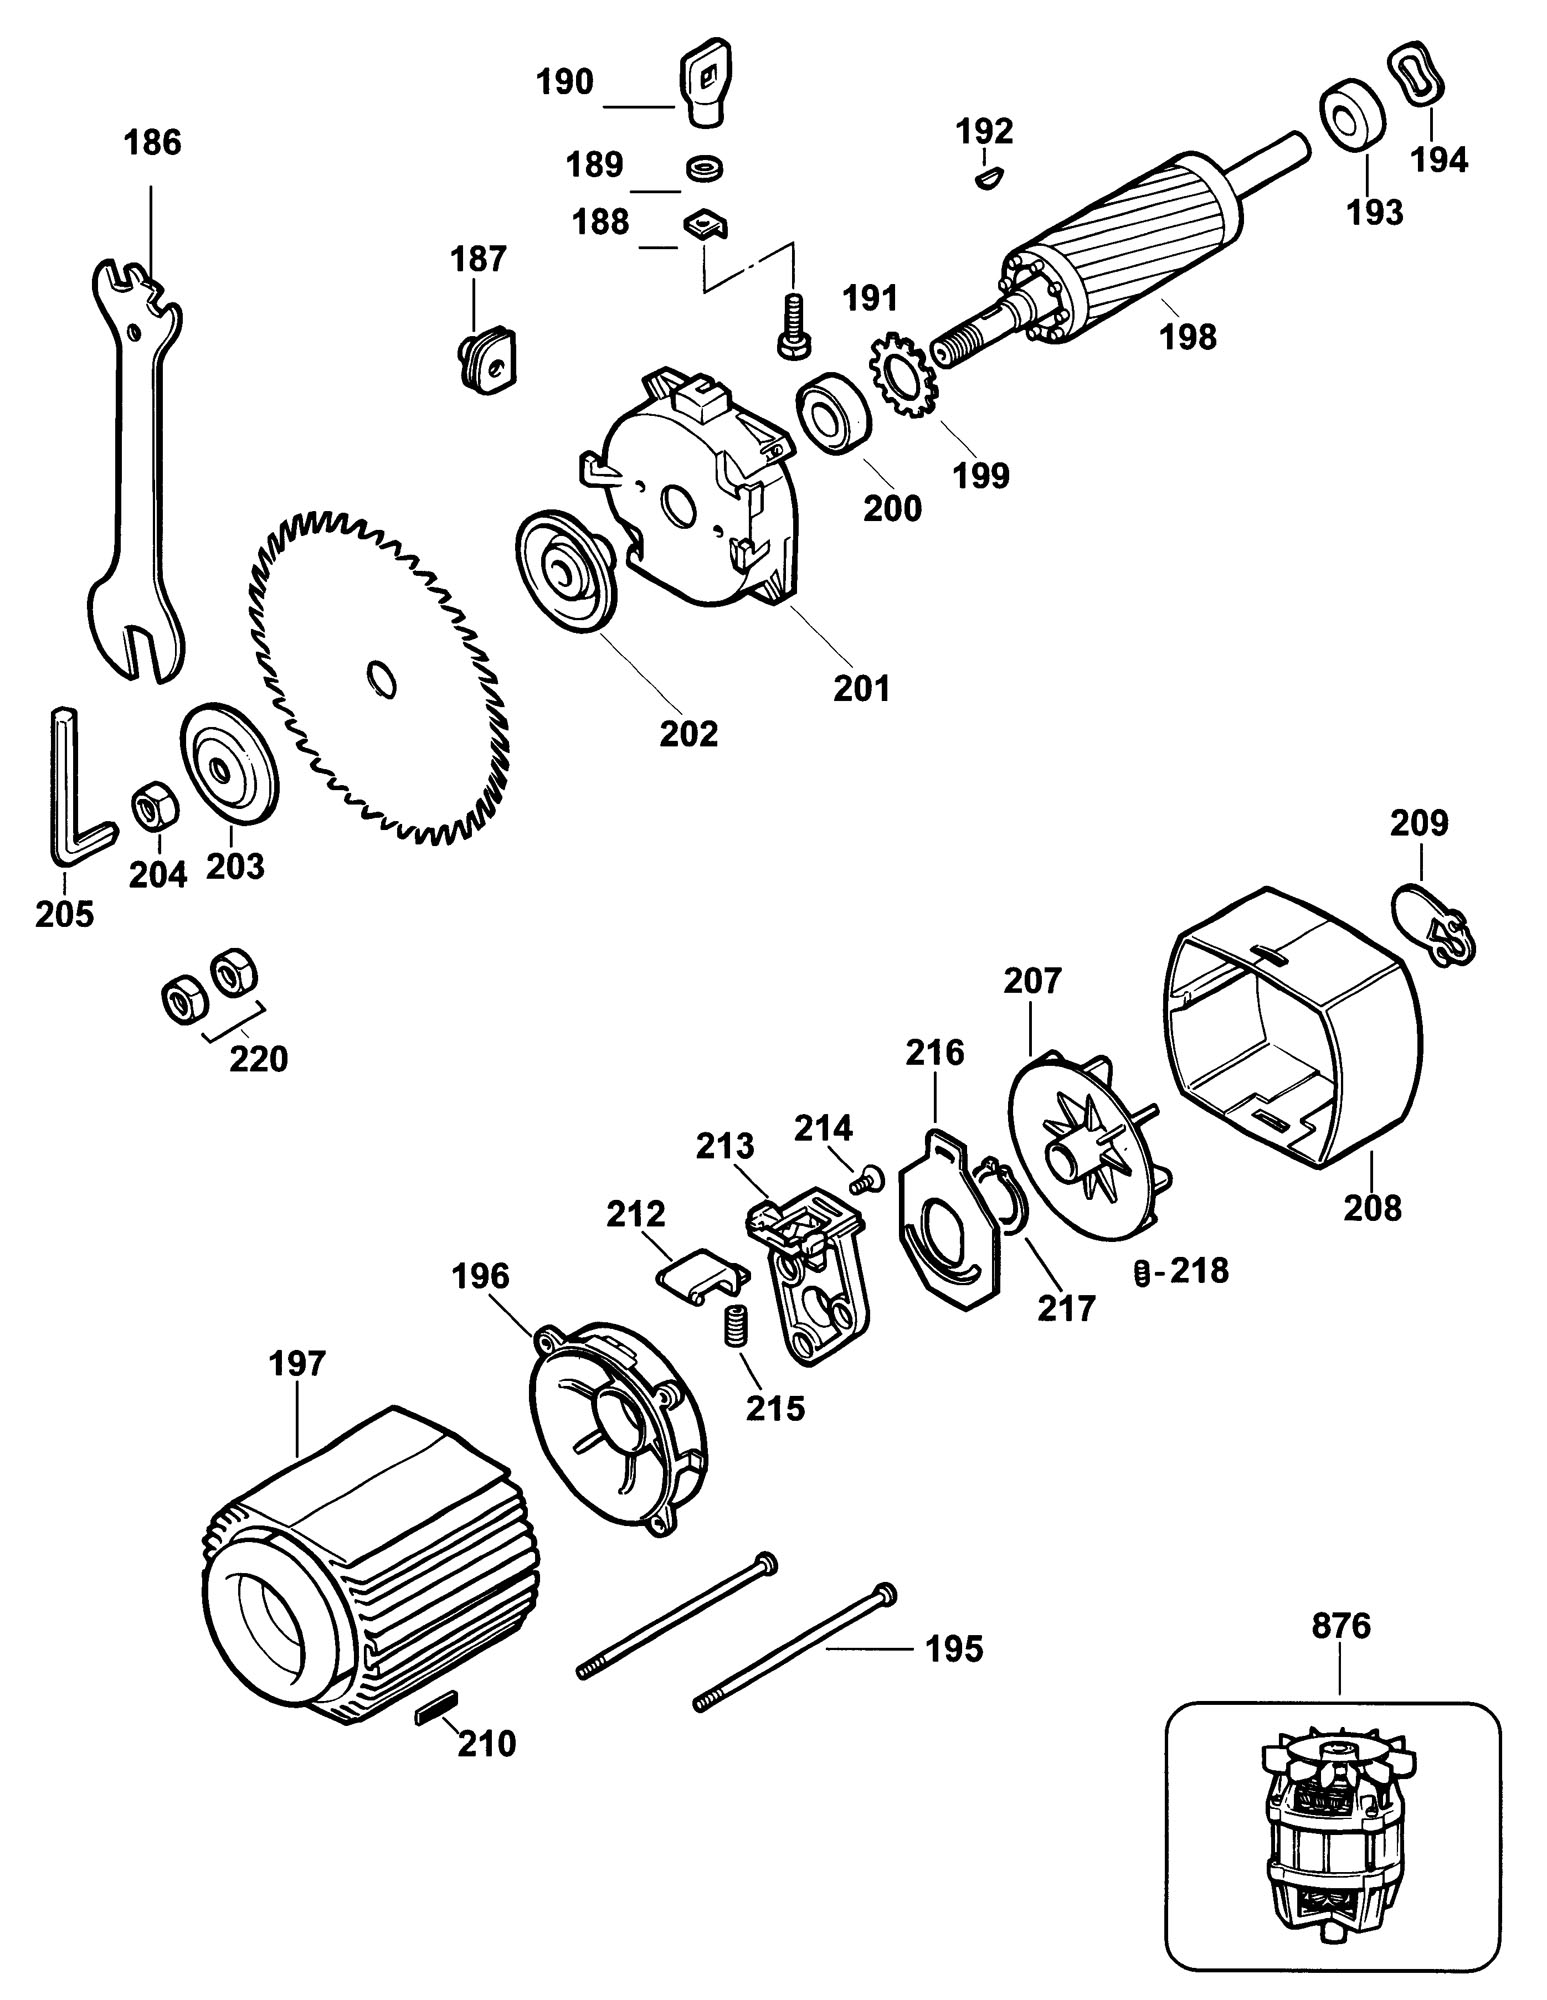 49cc engine parts diagram origami wolf instructions with transmission imageresizertool com